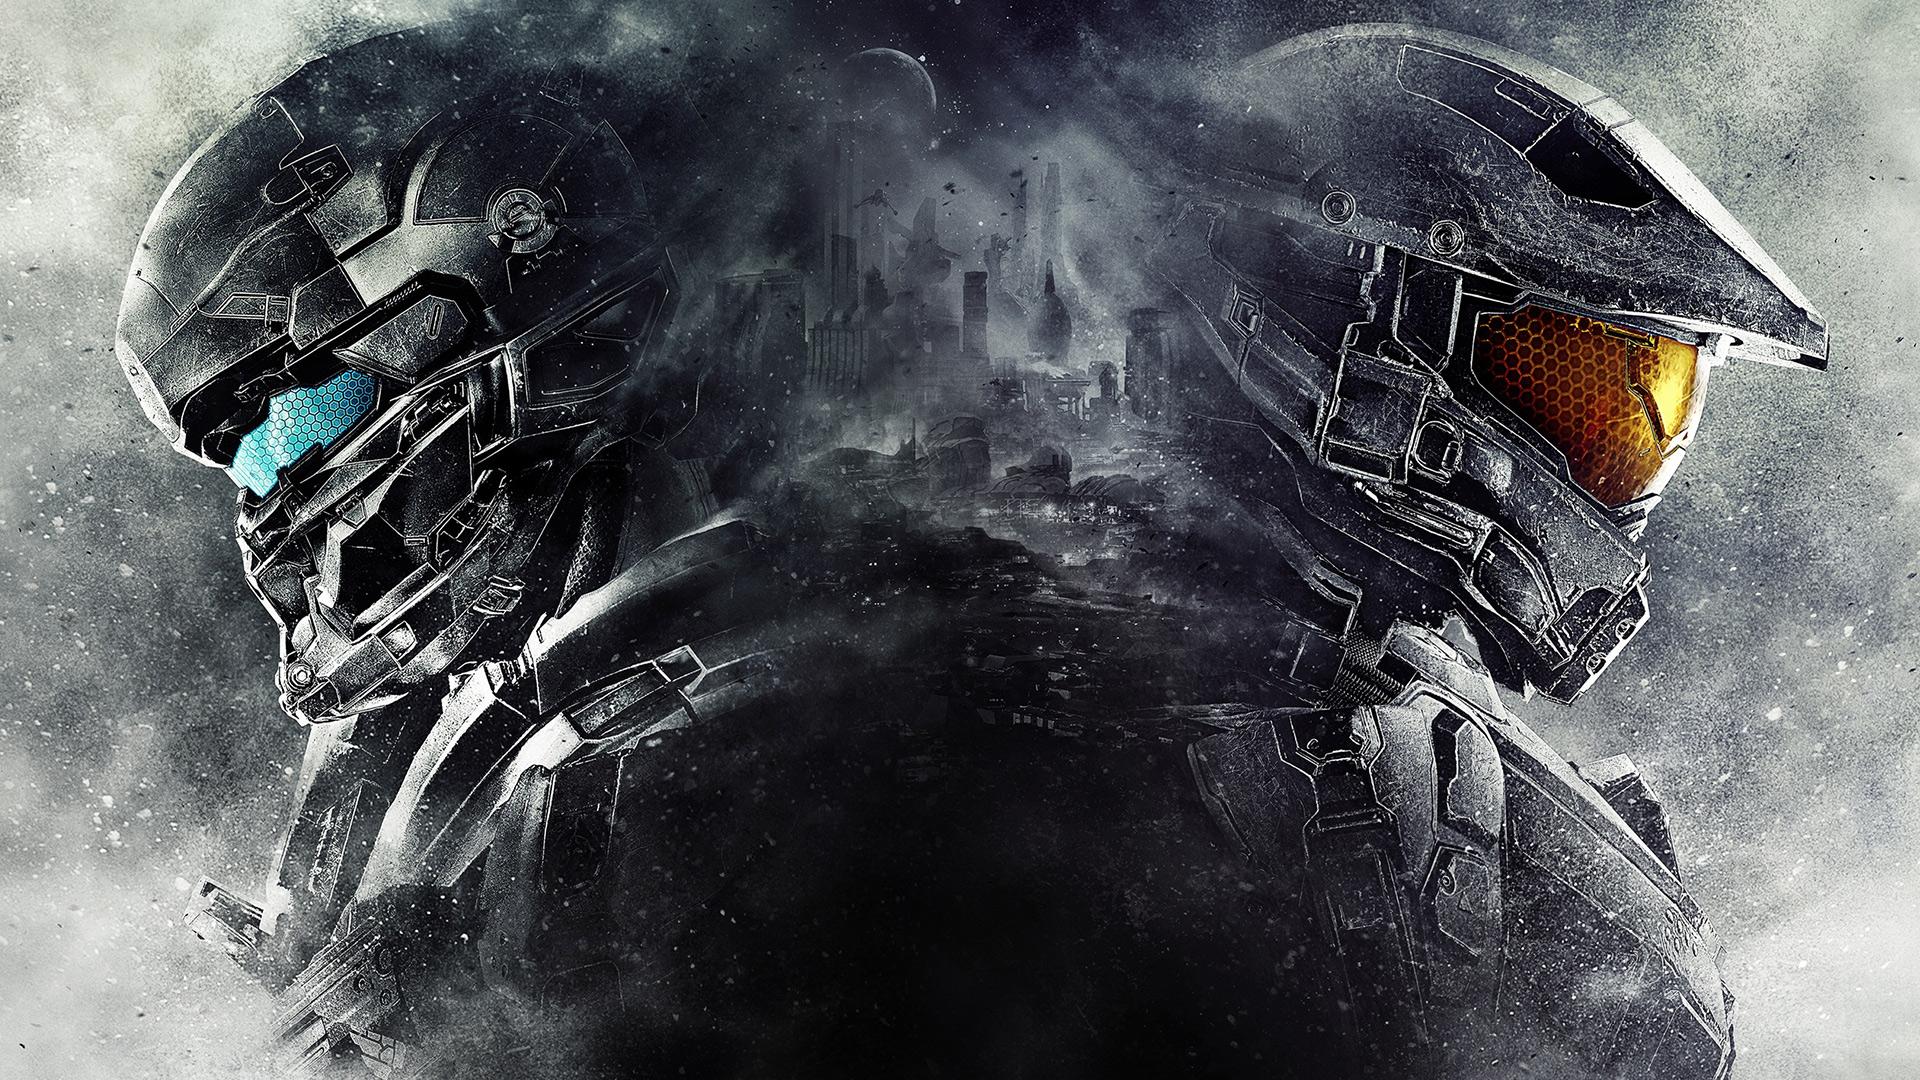 Halo: The Fall of Reach | Movie fanart | fanart.tv